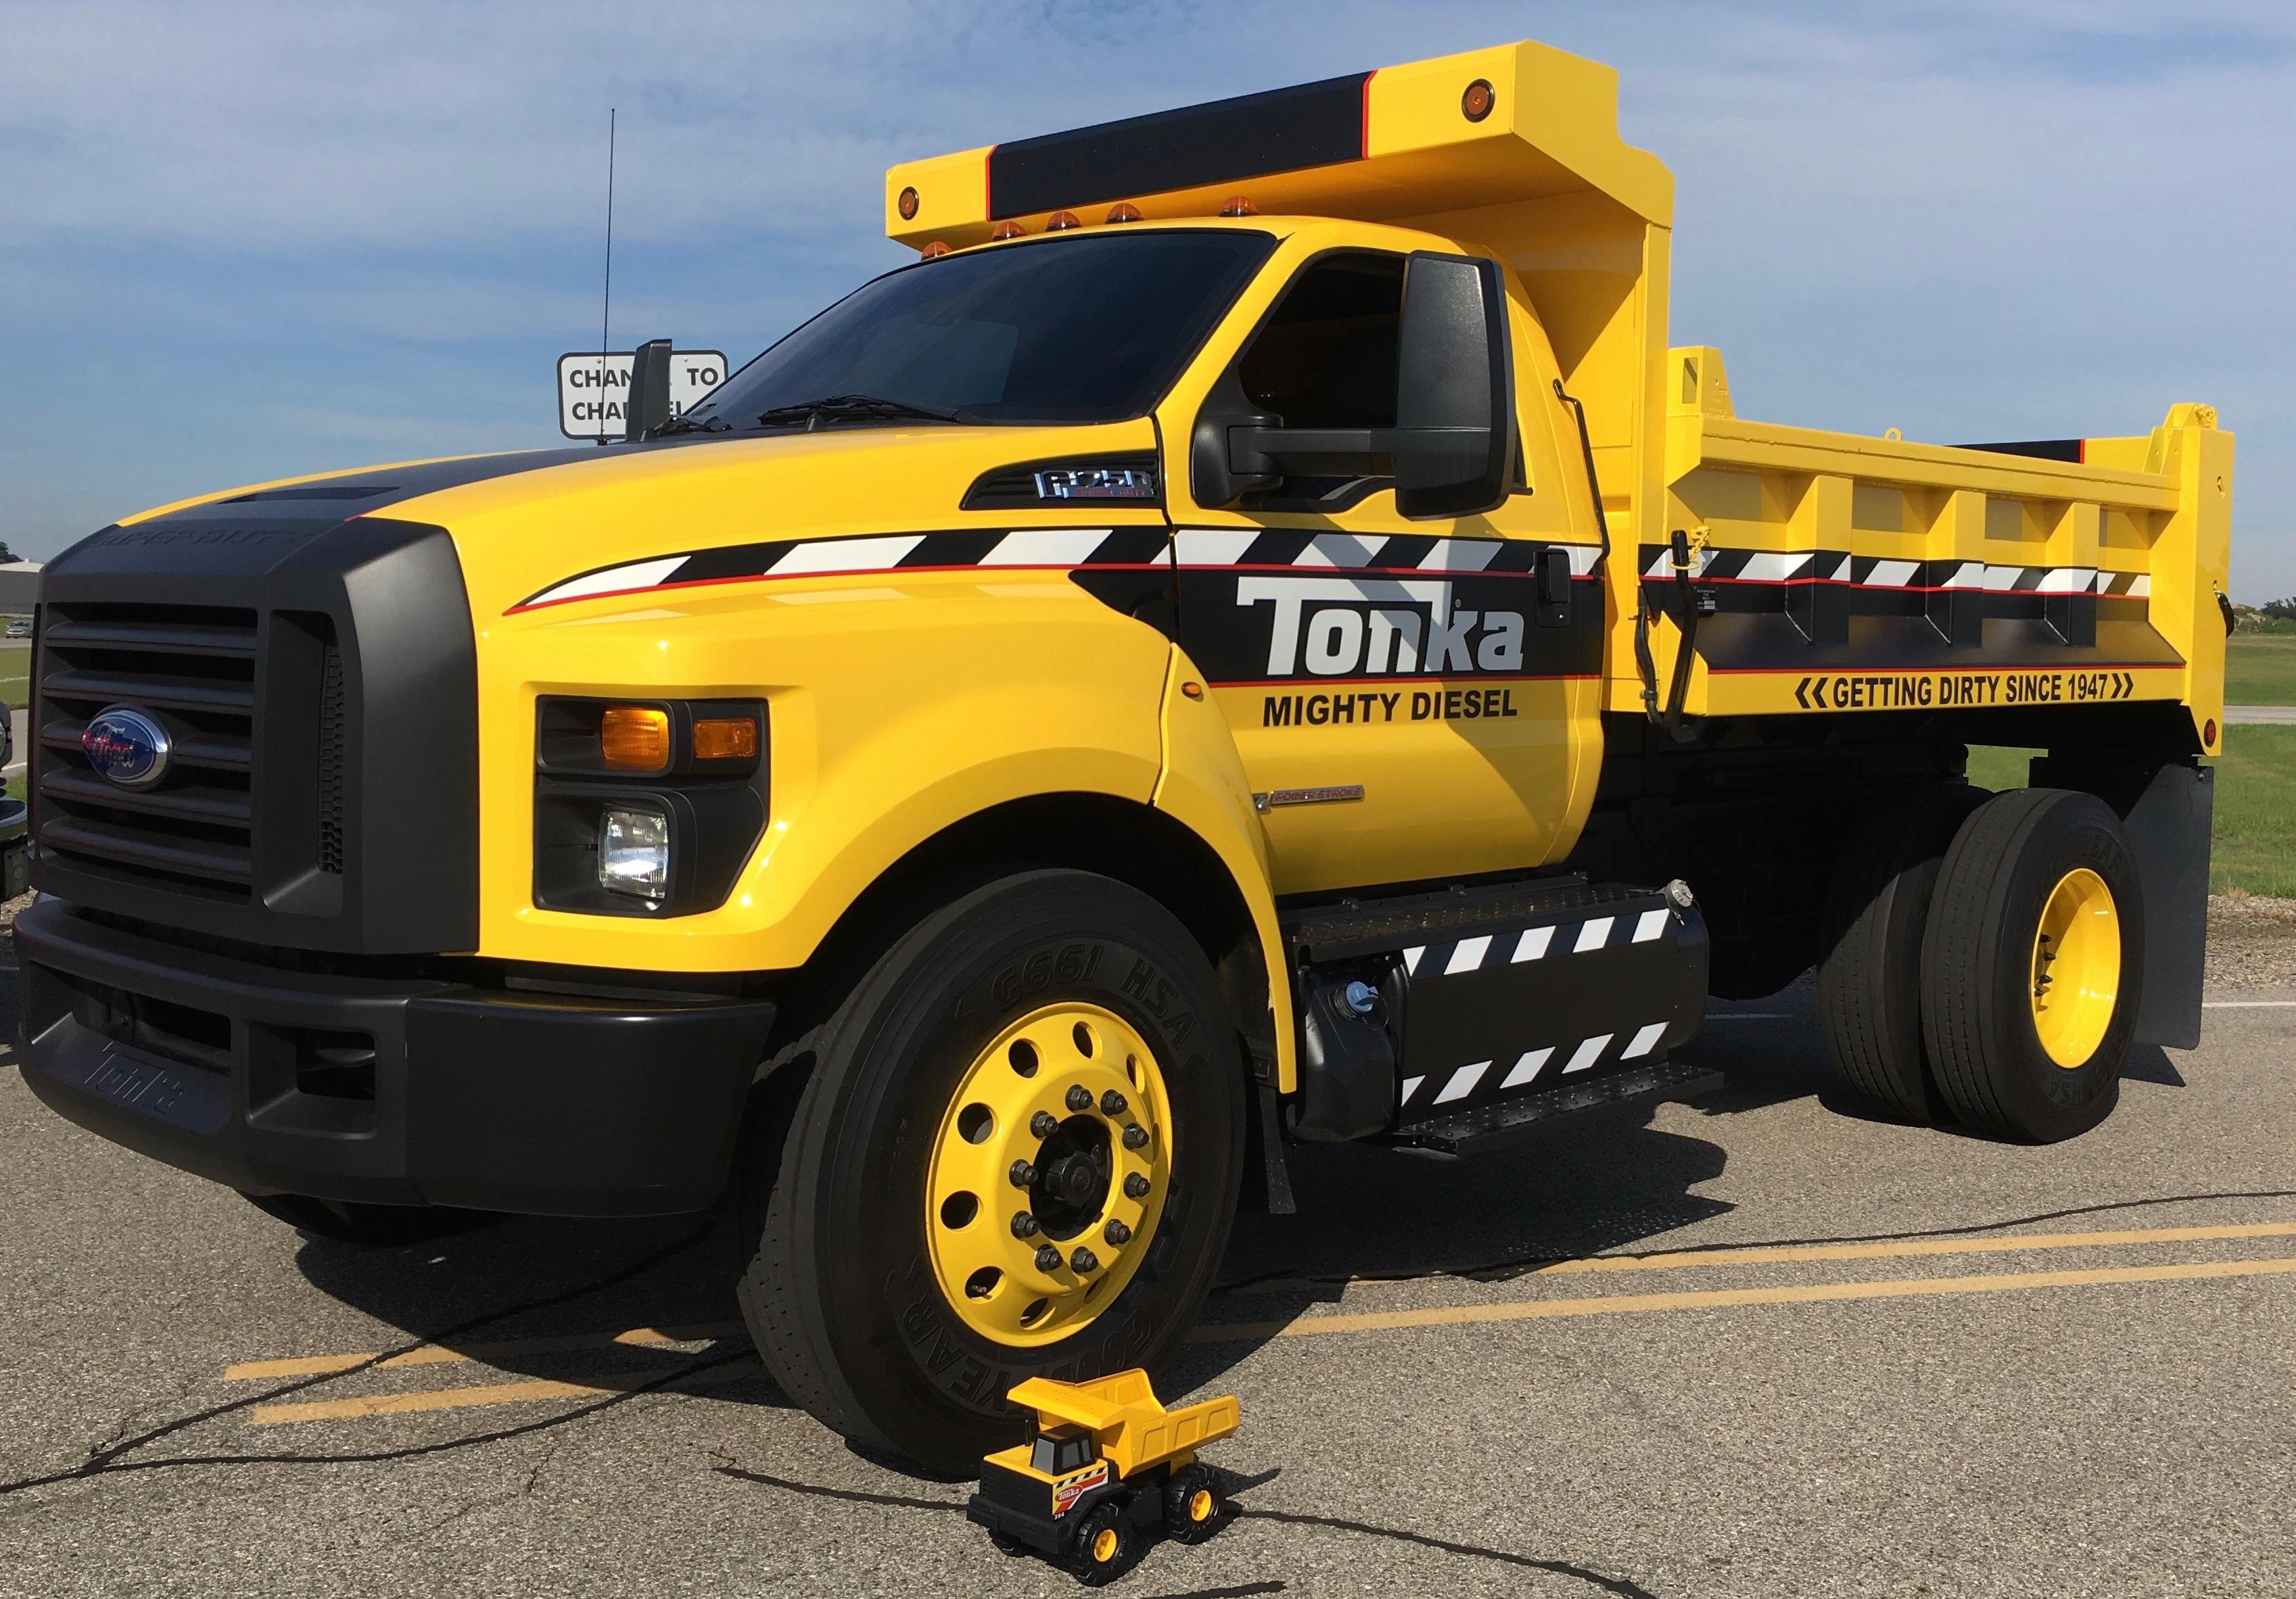 tonka-truck-big-and-small